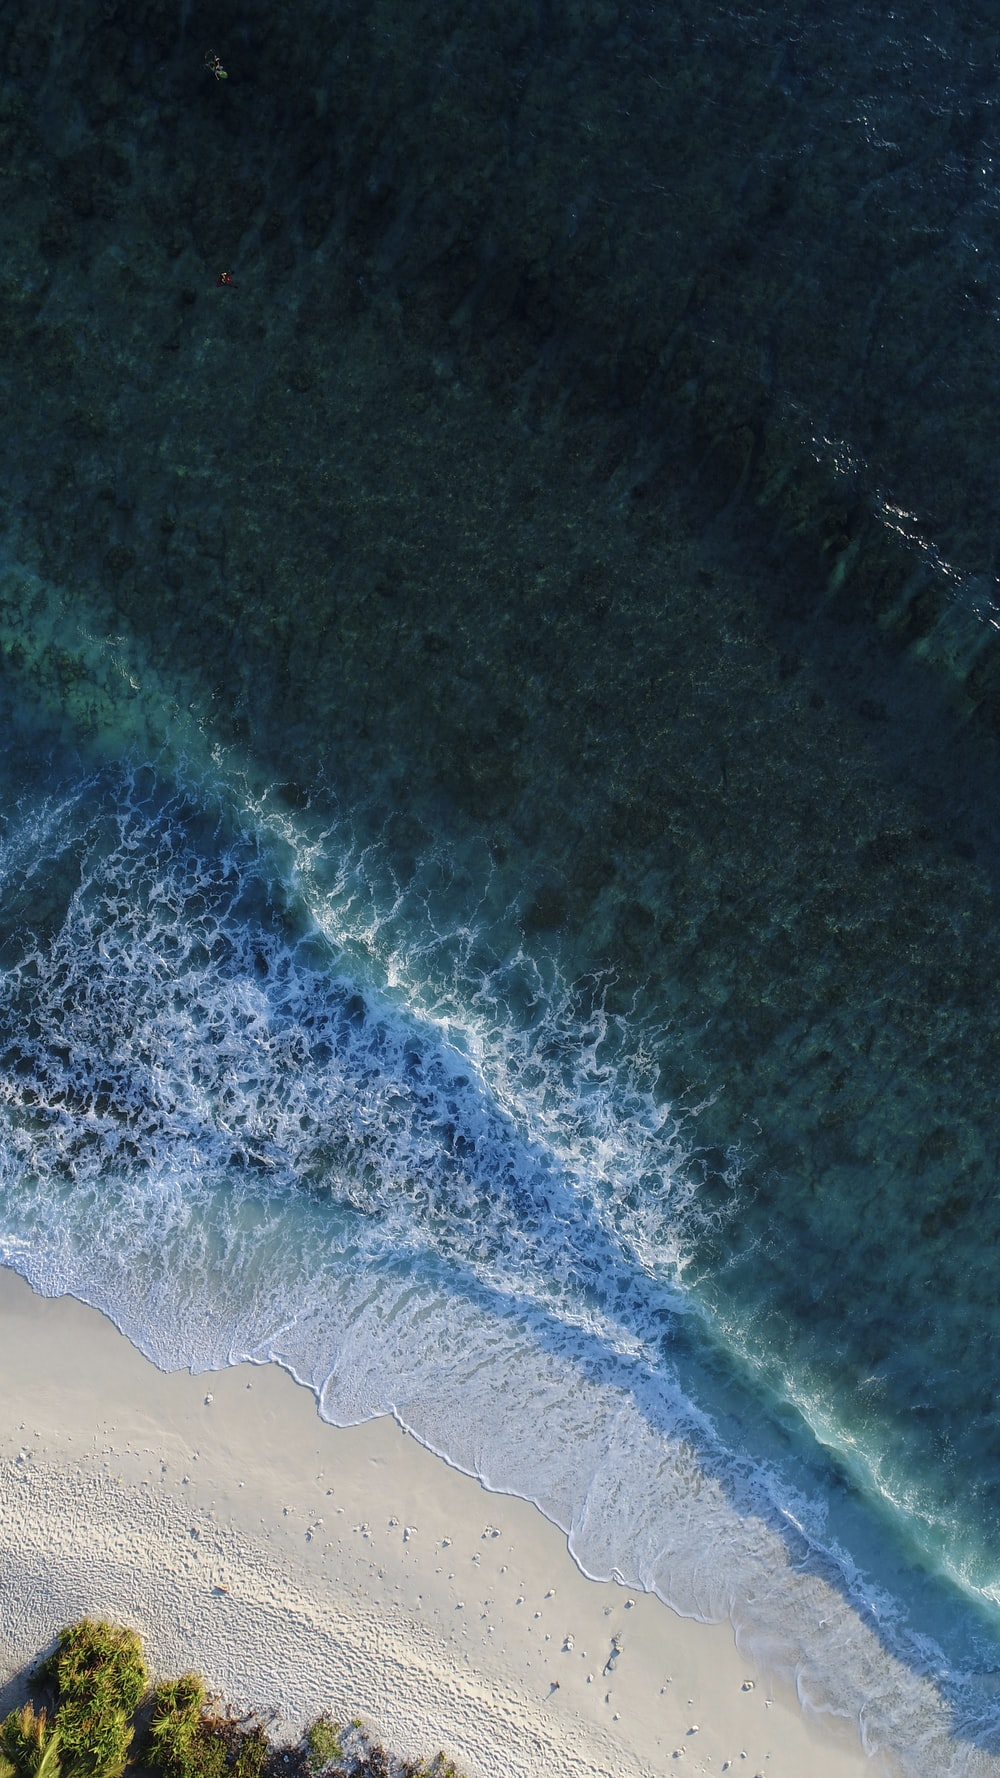 turquoise calm sea wave splashing on white sand beach aerial photography